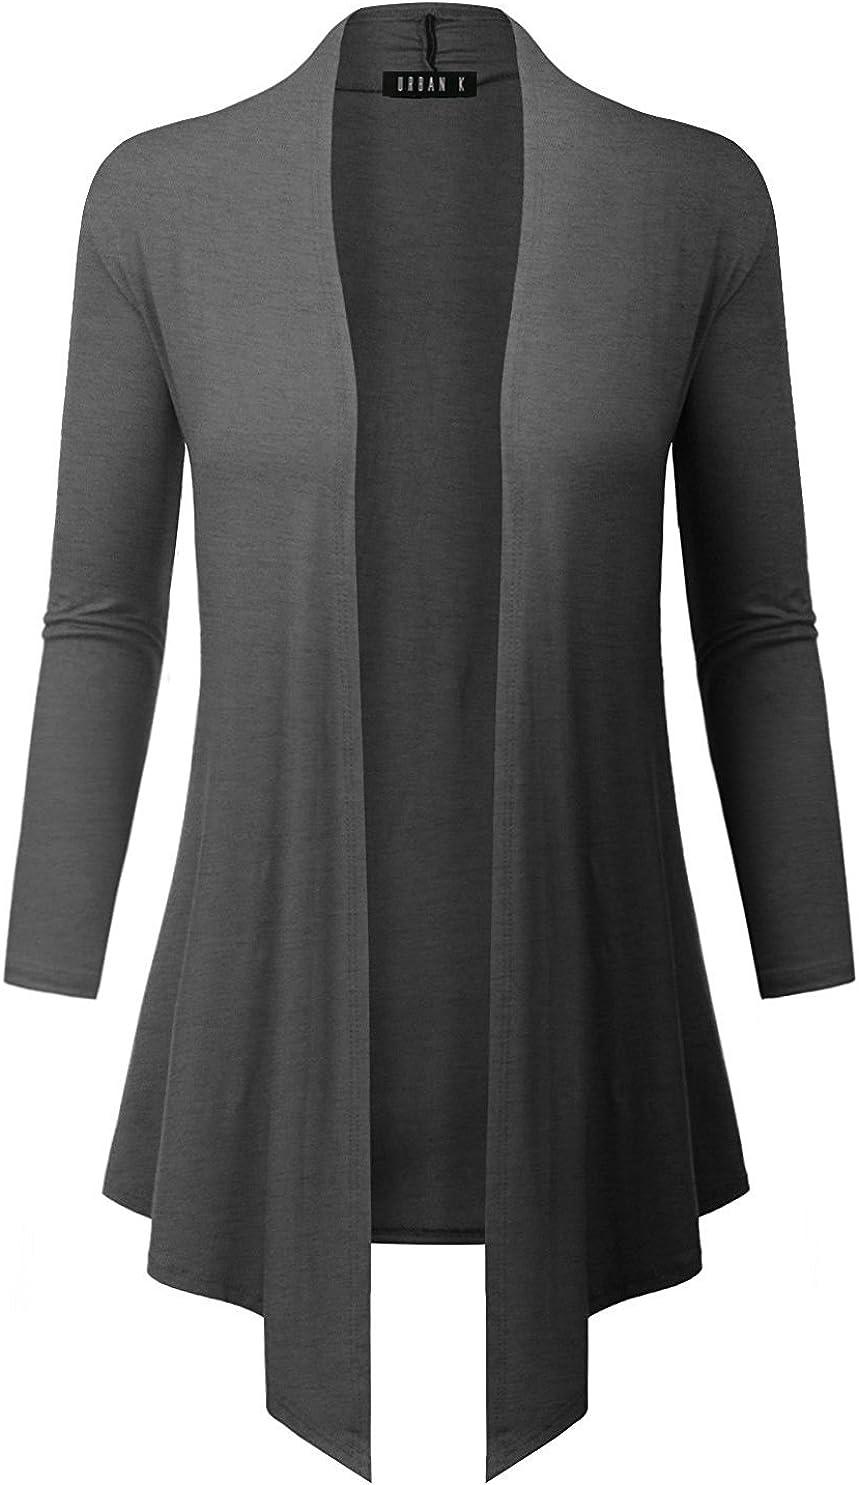 URBAN K Women's Short, Long, & 3/4 Sleeve Open Front Drape Hem Lightweight Cardigan Regular & Plus Size